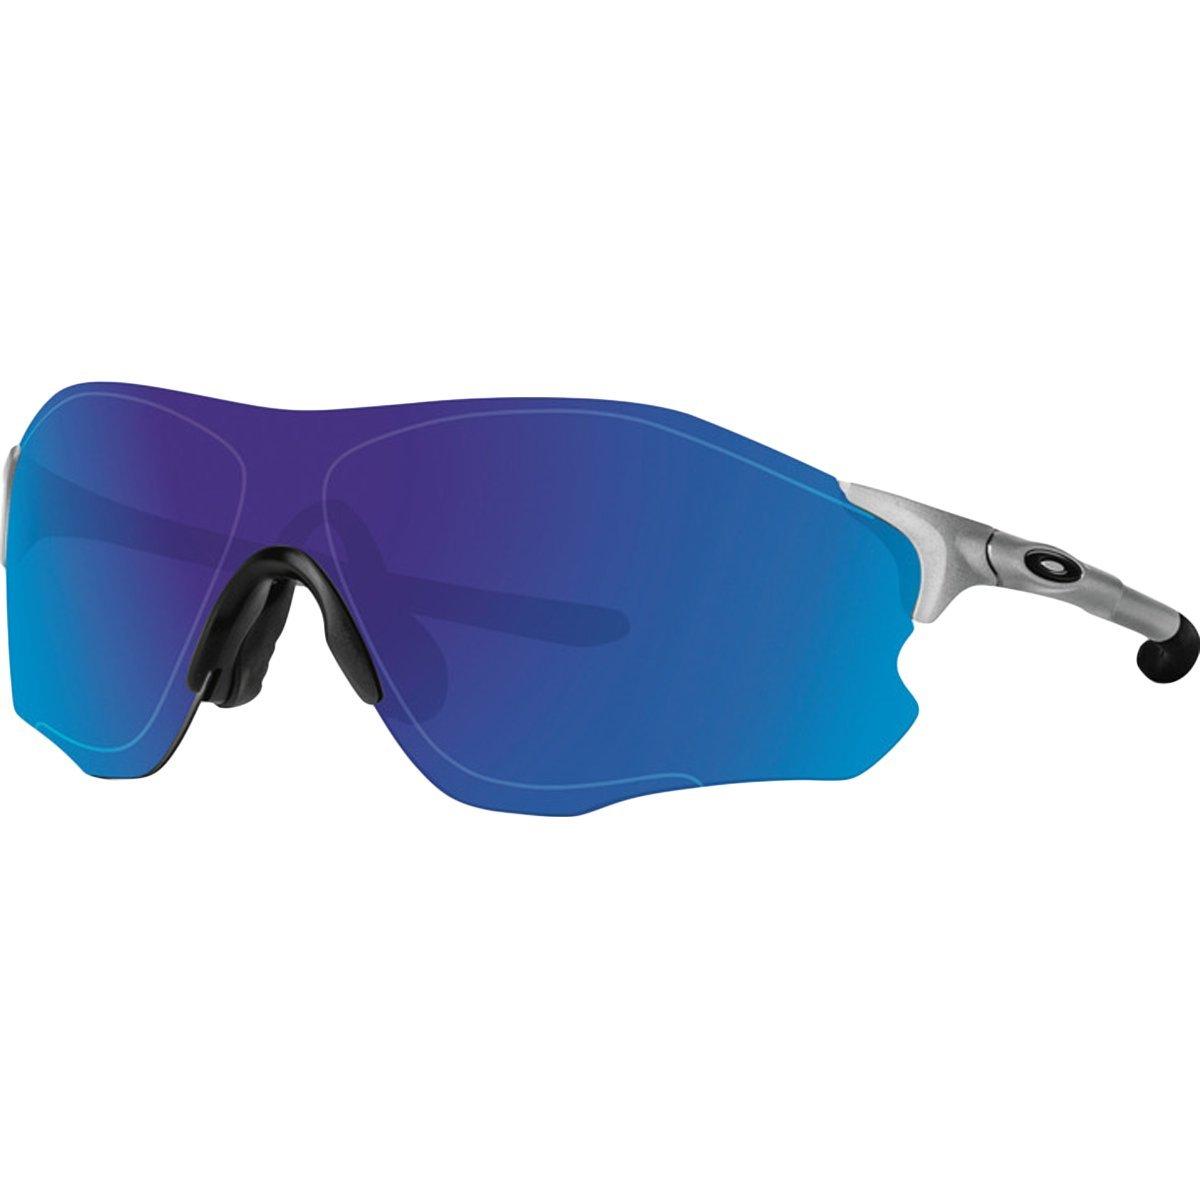 Oakley Men's Evzero Path Non-Polarized Iridium Rectangular Sunglasses, Silver, 38 mm